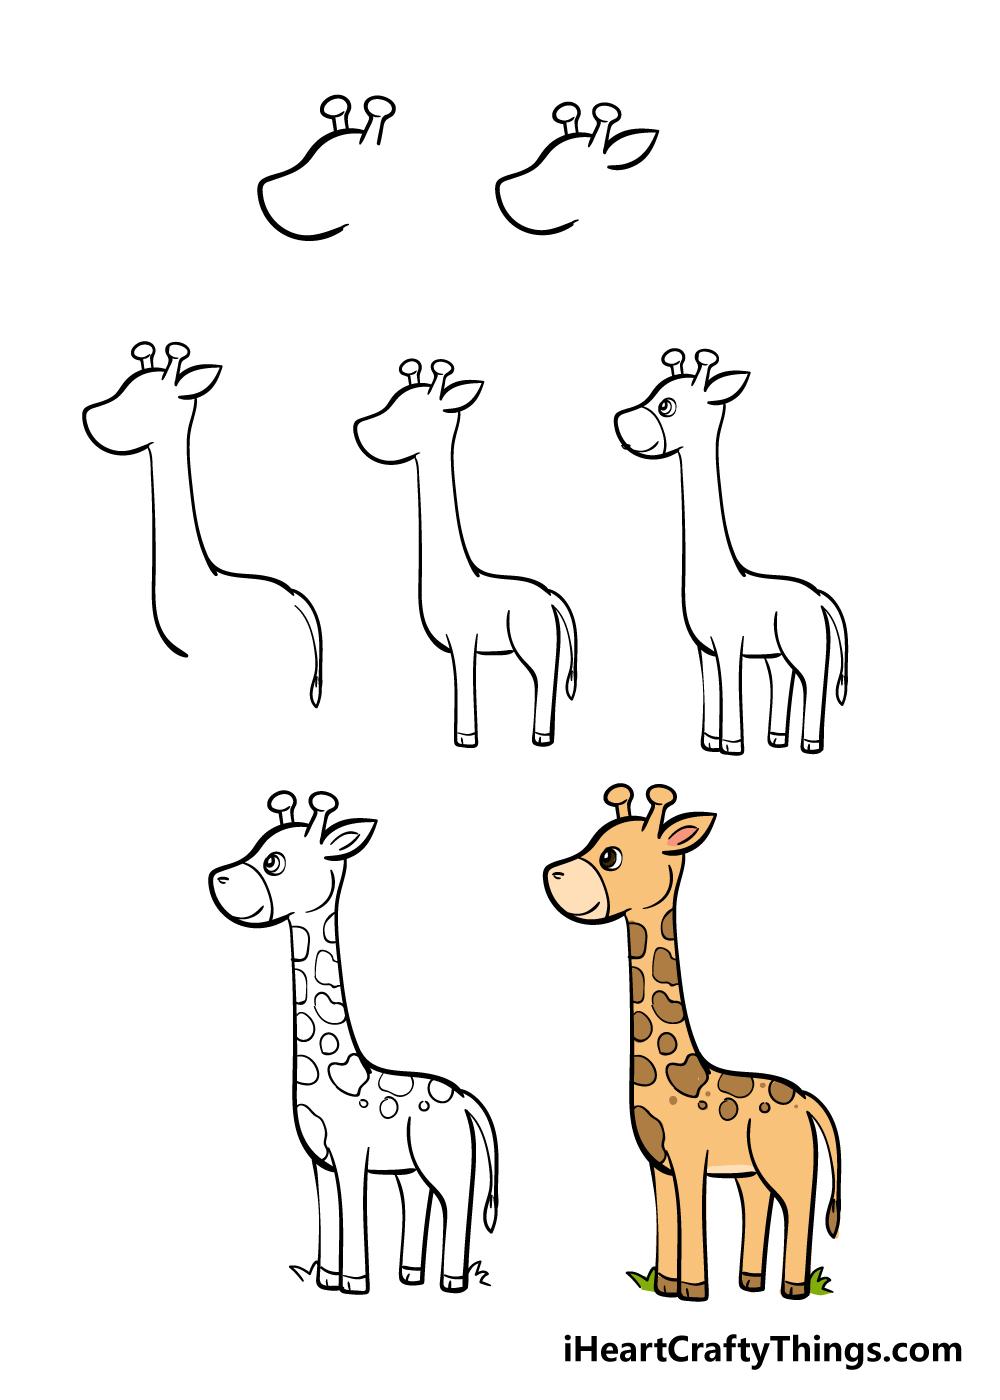 how to draw giraffe in 7 steps